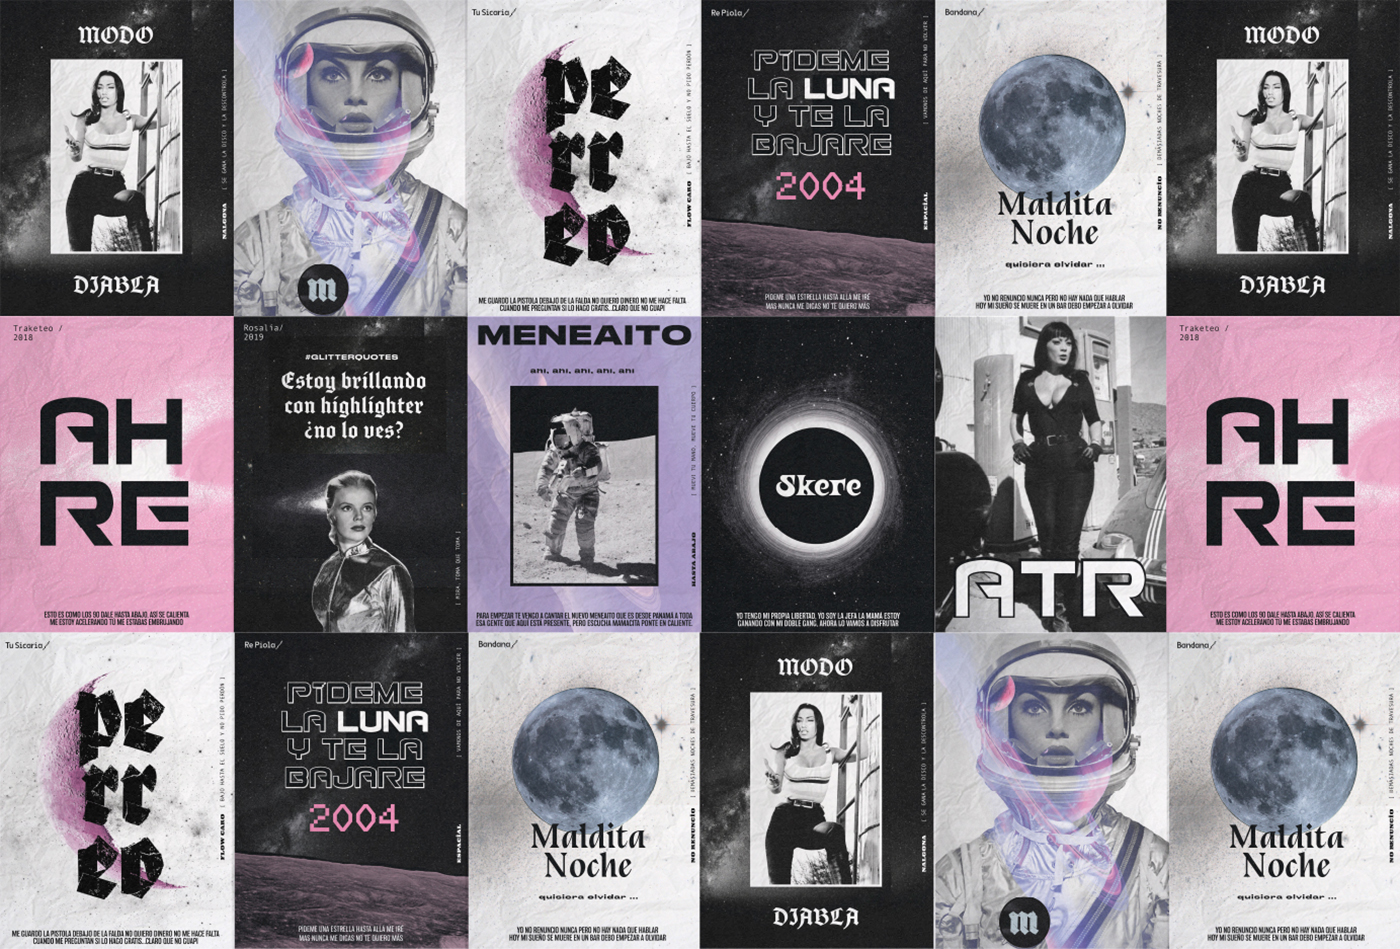 La Mala Pub's New Spatial Identity by Estudio Nuar